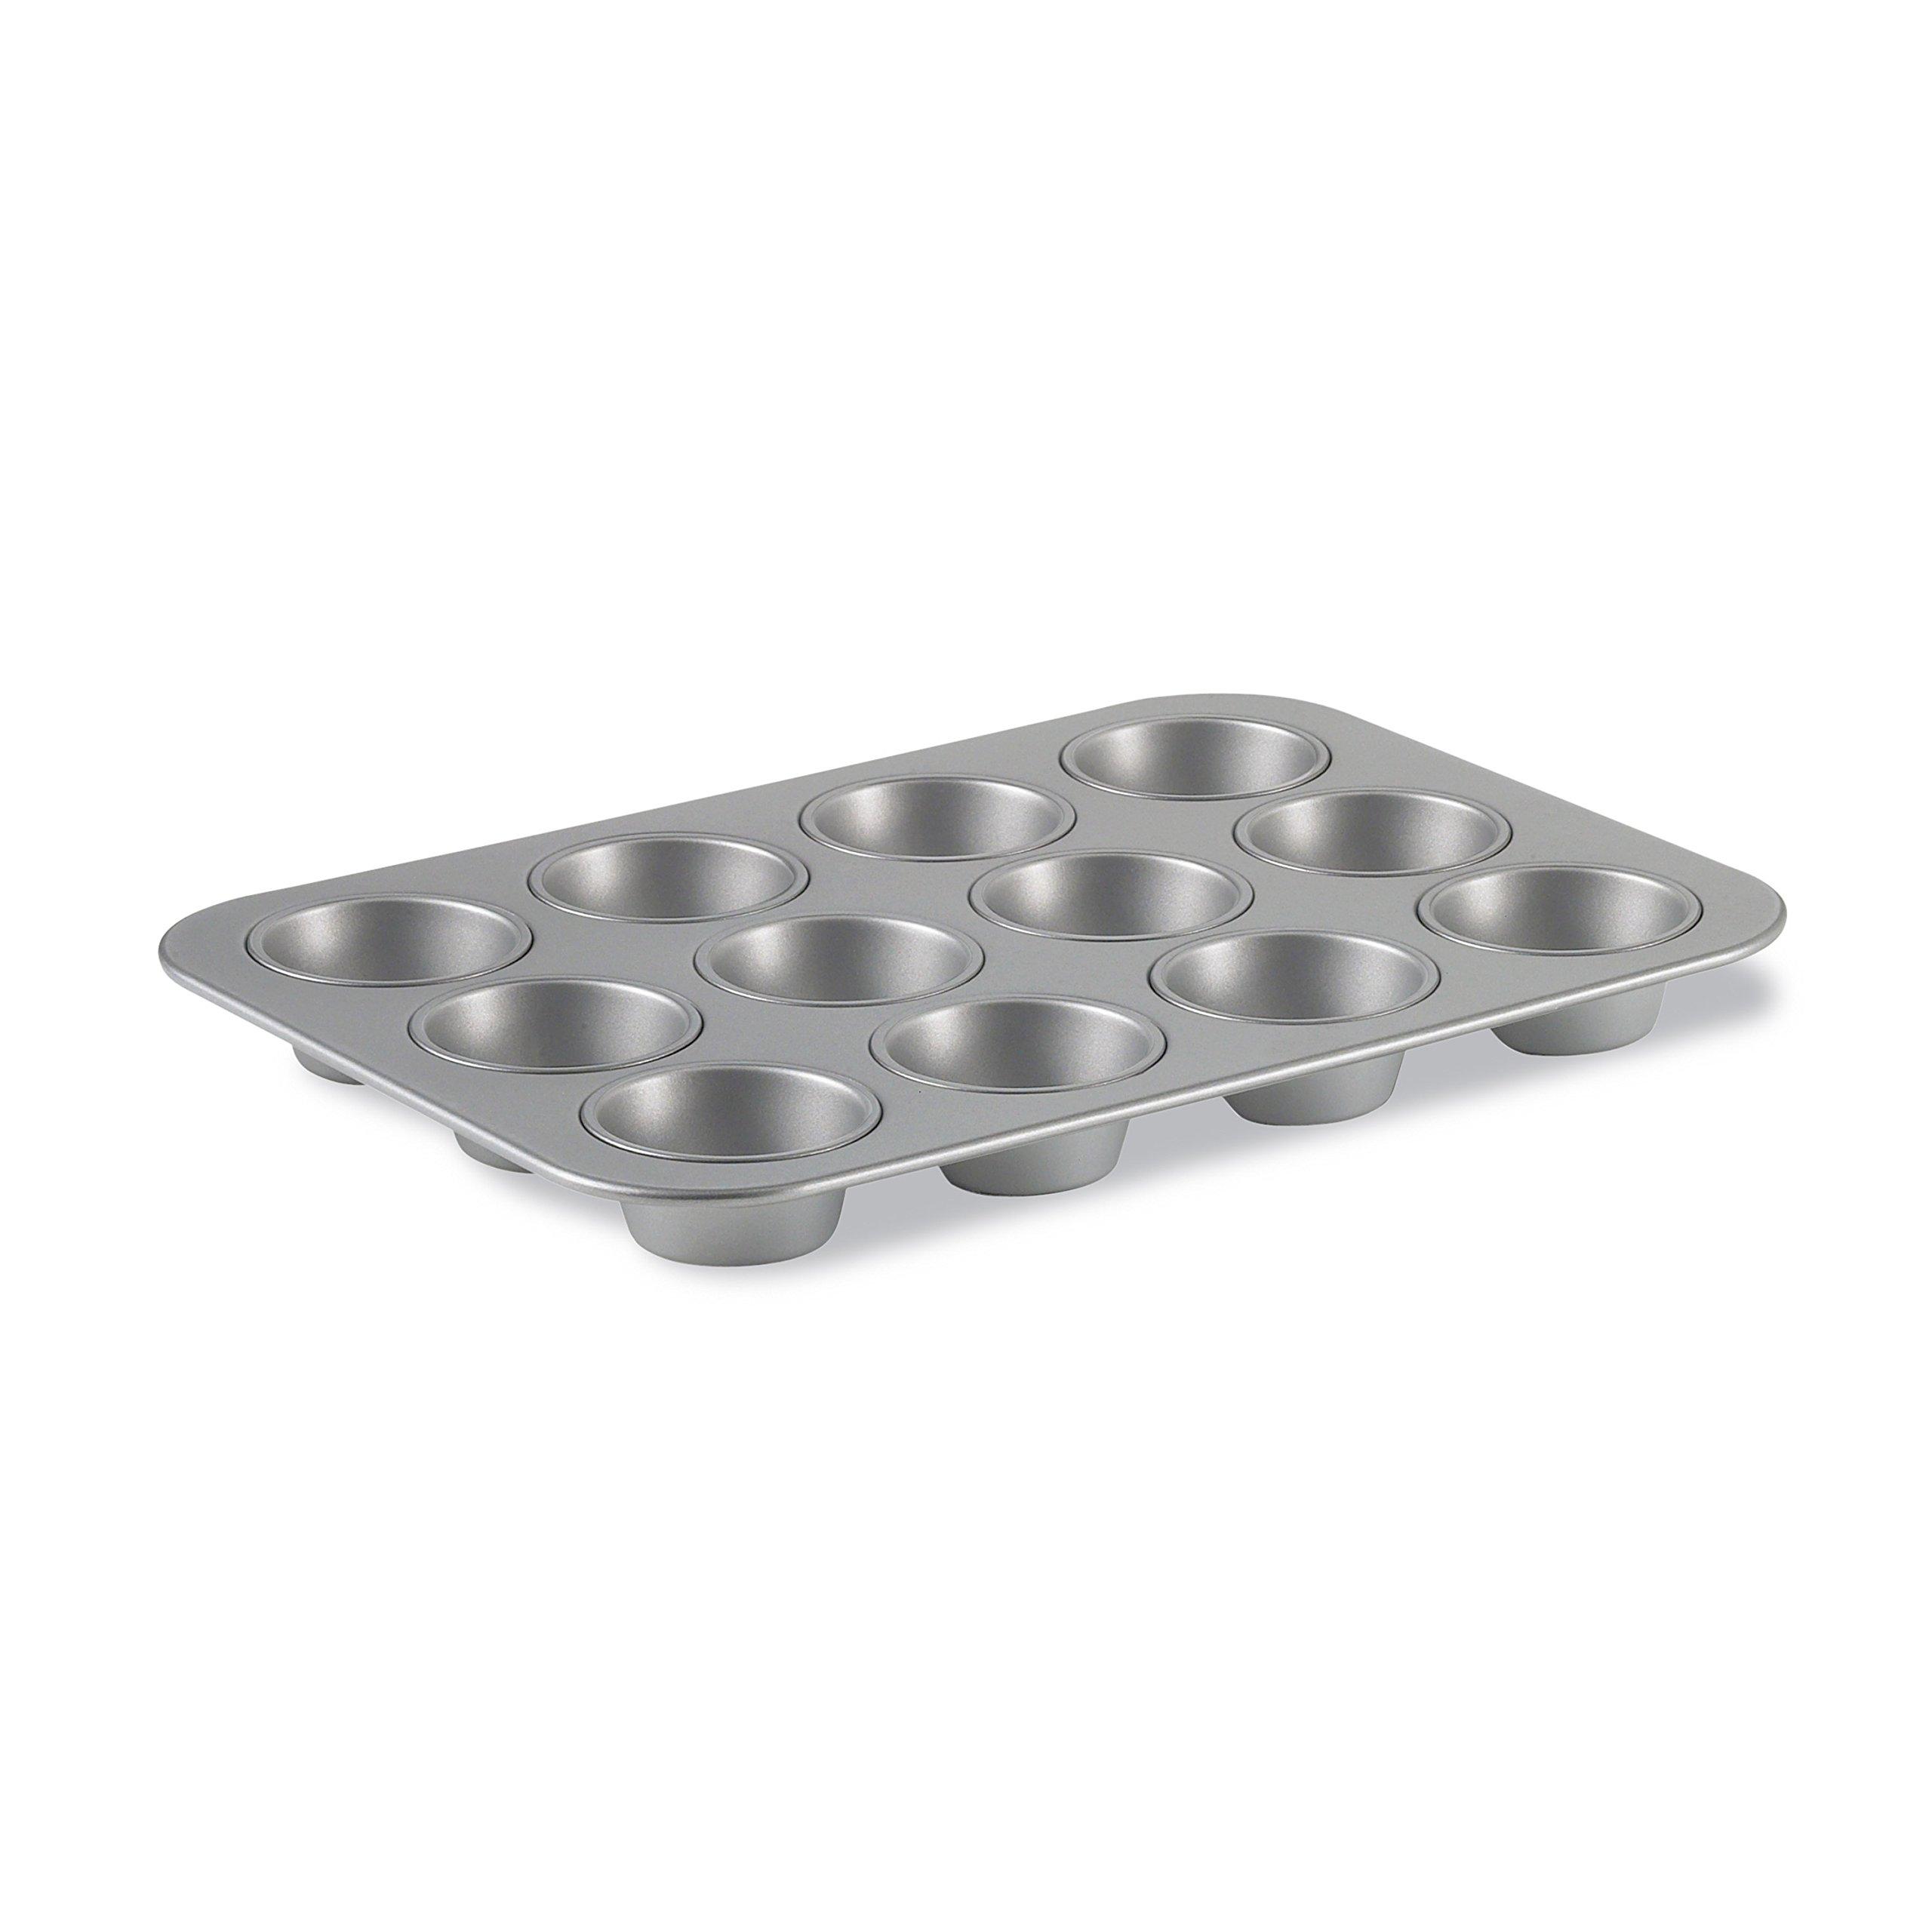 Calphalon Nonstick Bakeware, Cupcake/Muffin Pan, 12-cup